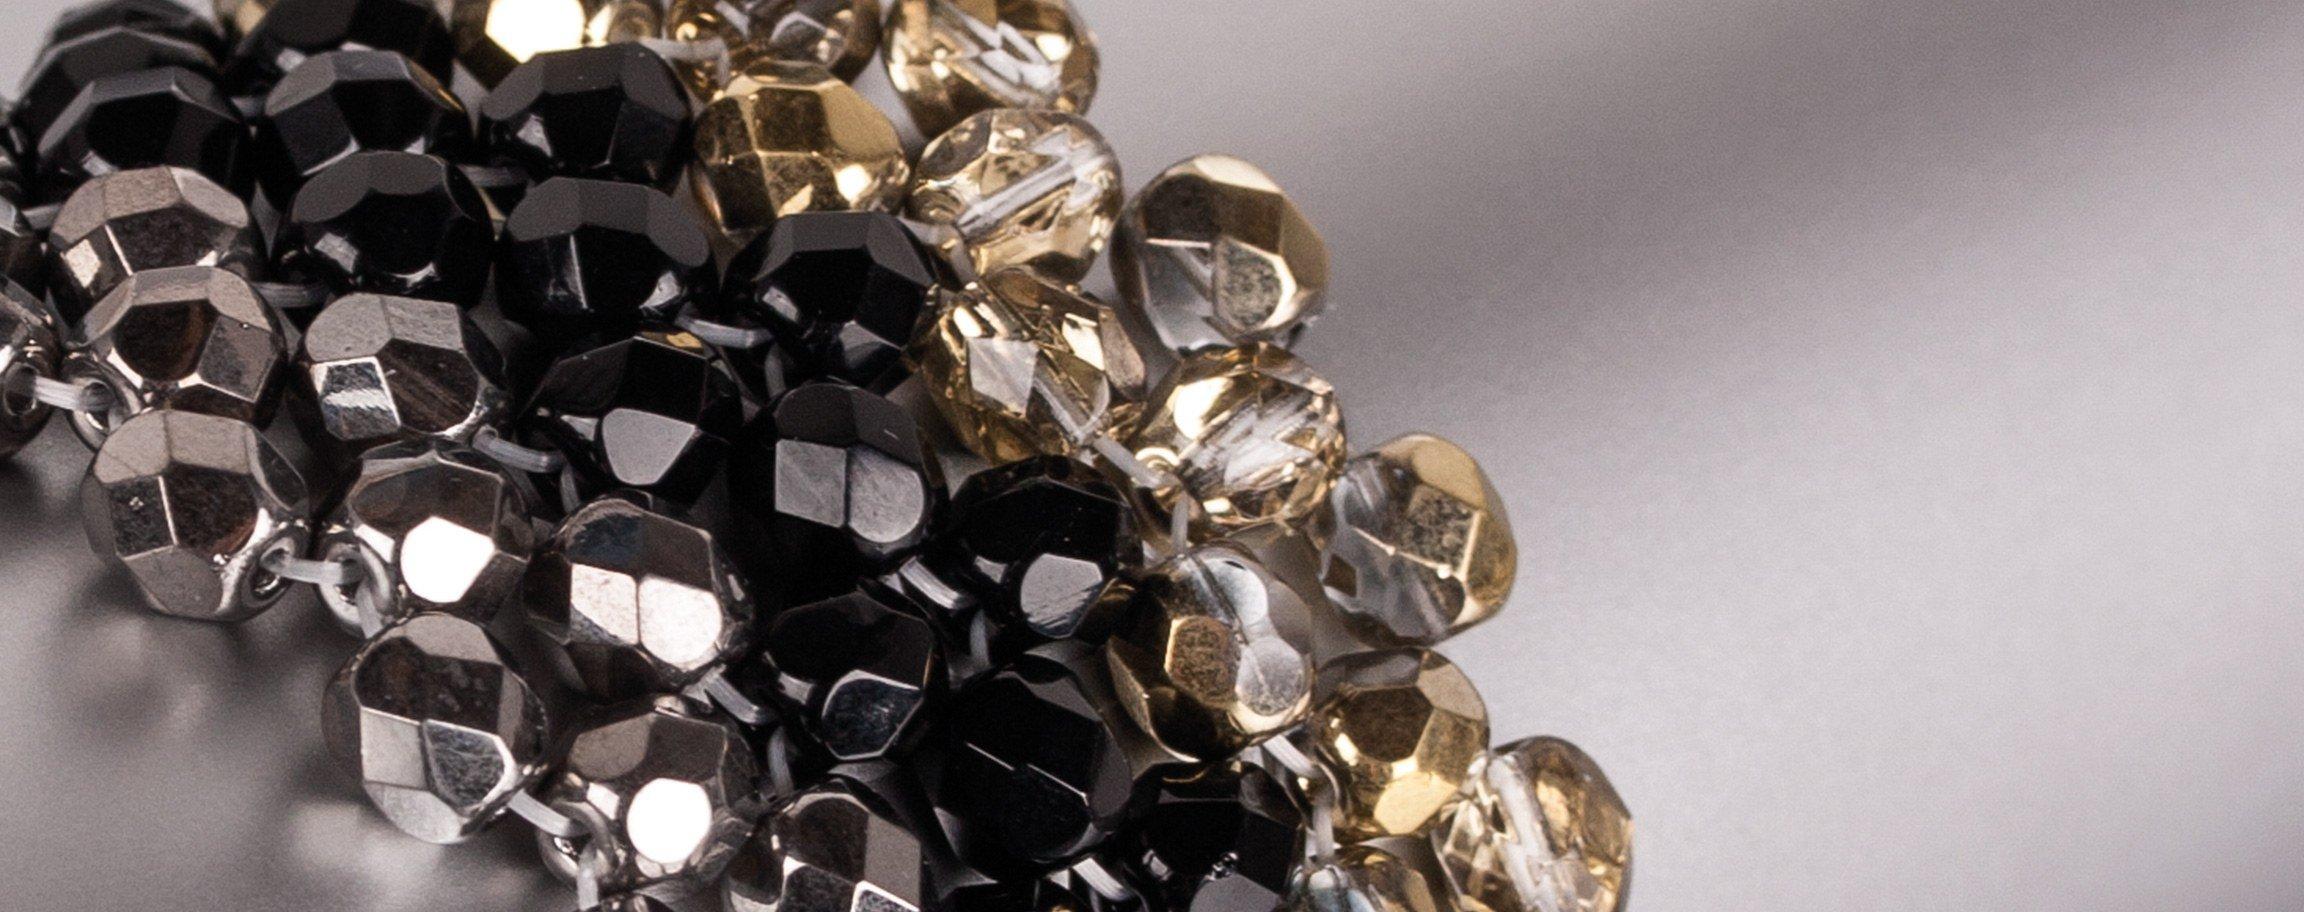 Schwarz-goldfarbenes, breites Armband